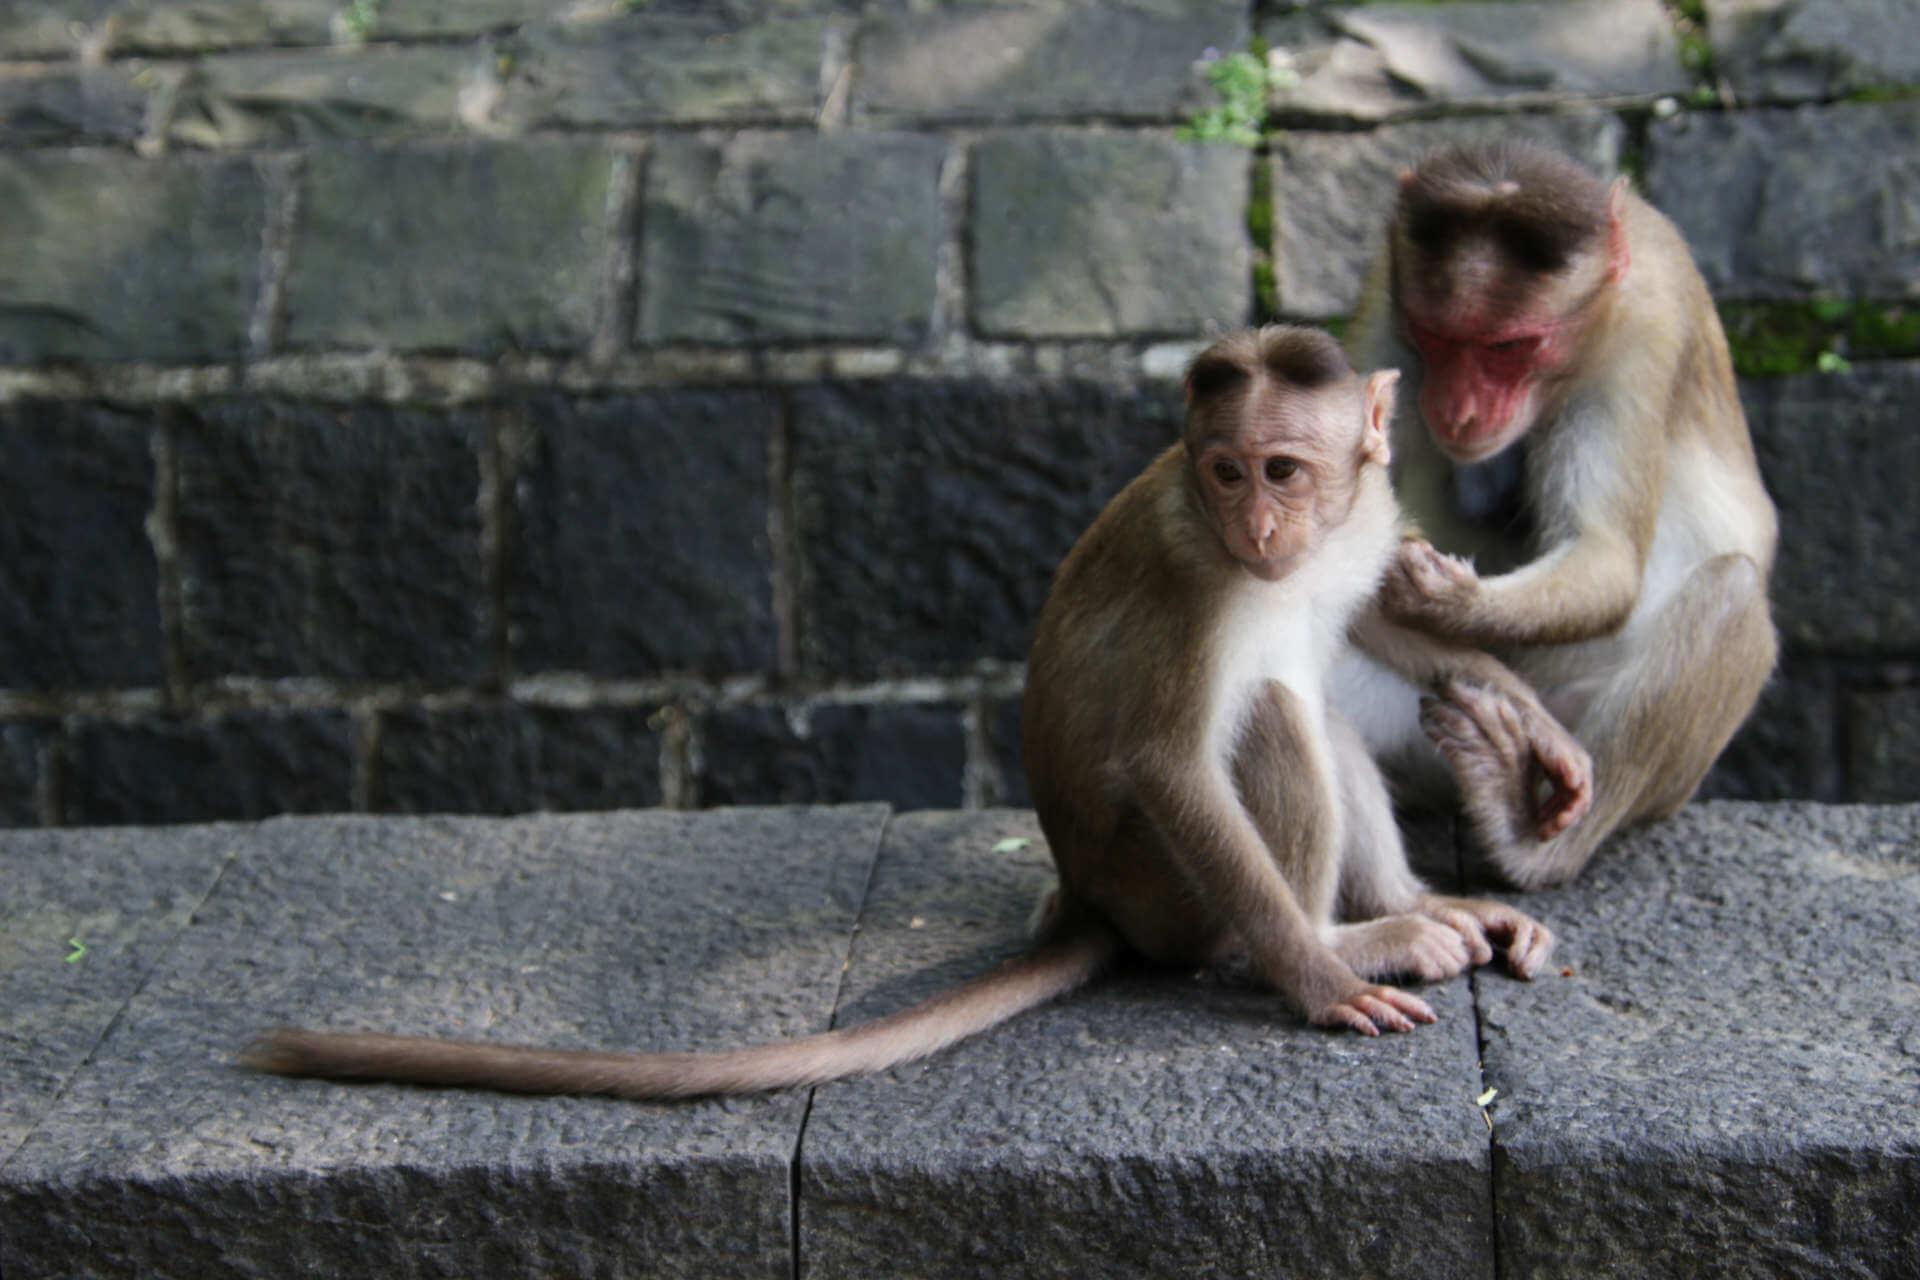 Indien Mumbai Elephanta Island Affe laust Kind